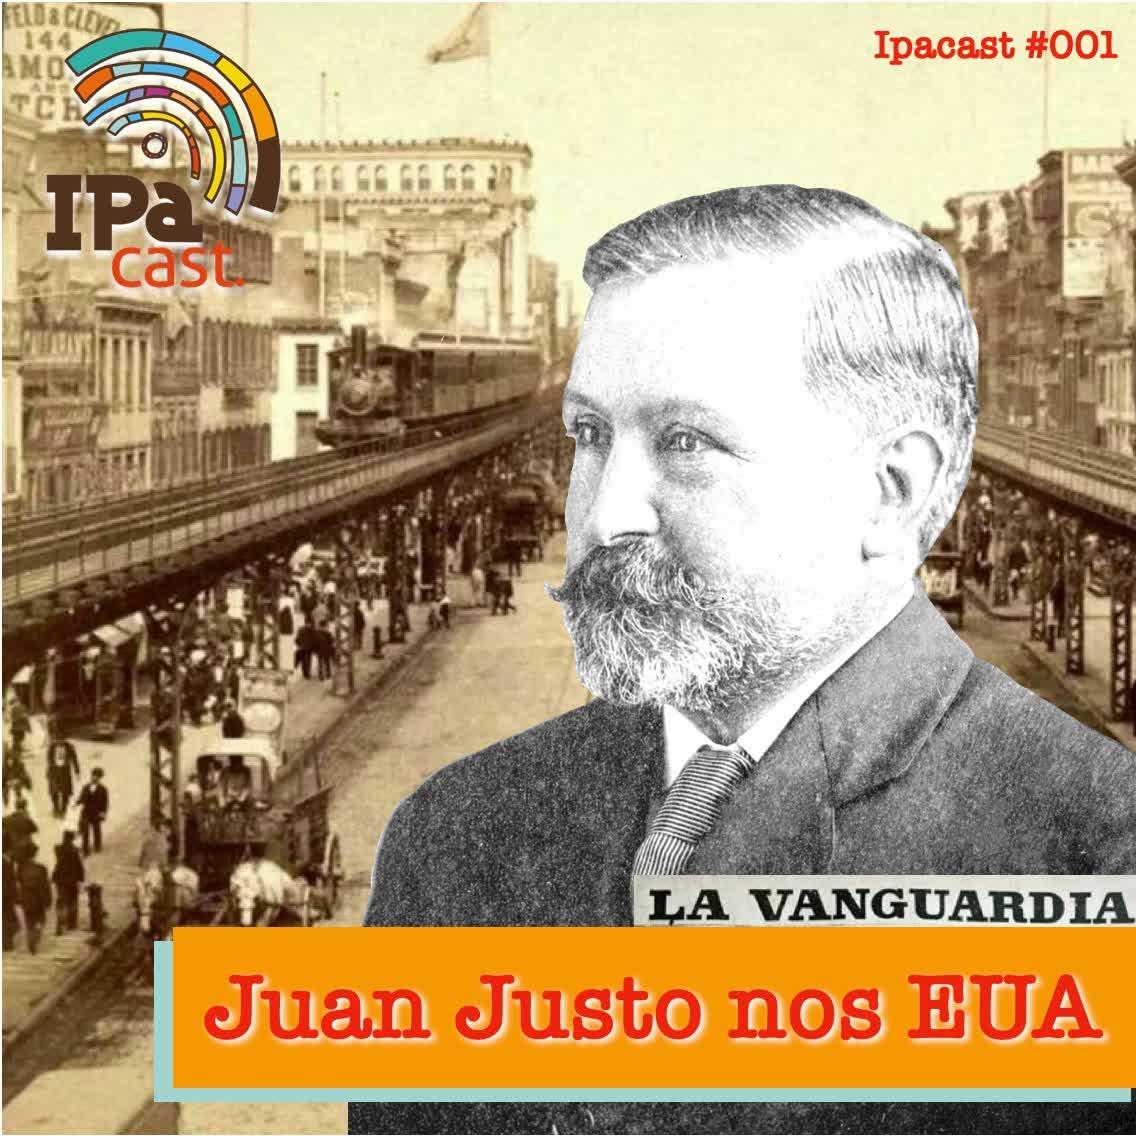 IPACast #001: Juan B. Justo nos EUA